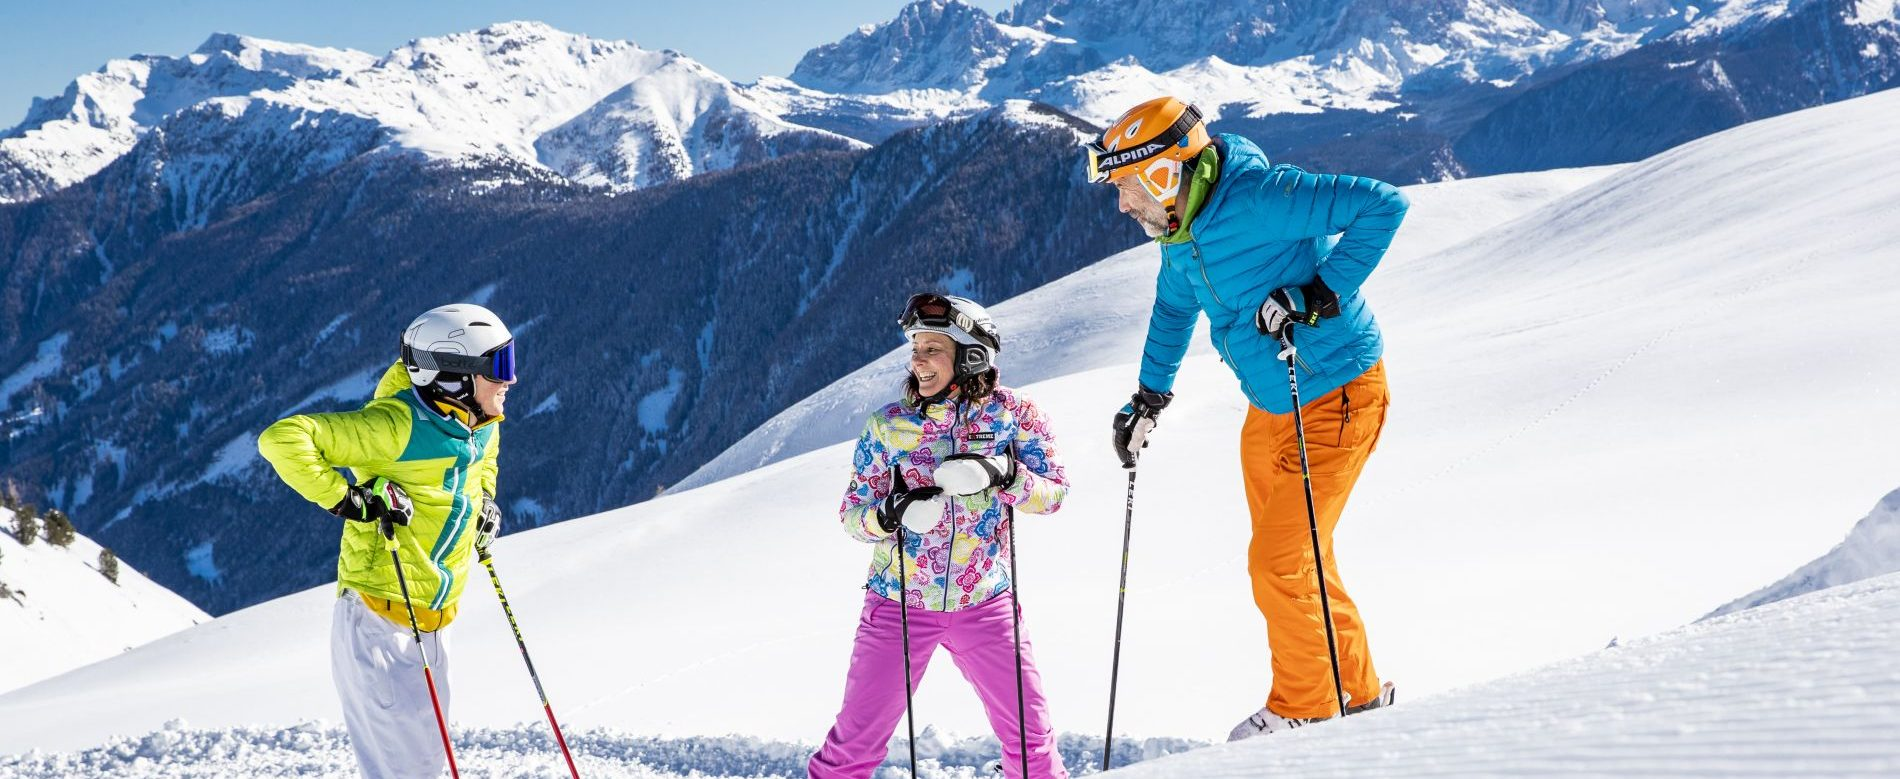 ski-pic-pampeago-ski-center-latemar-trentino-alto-adige